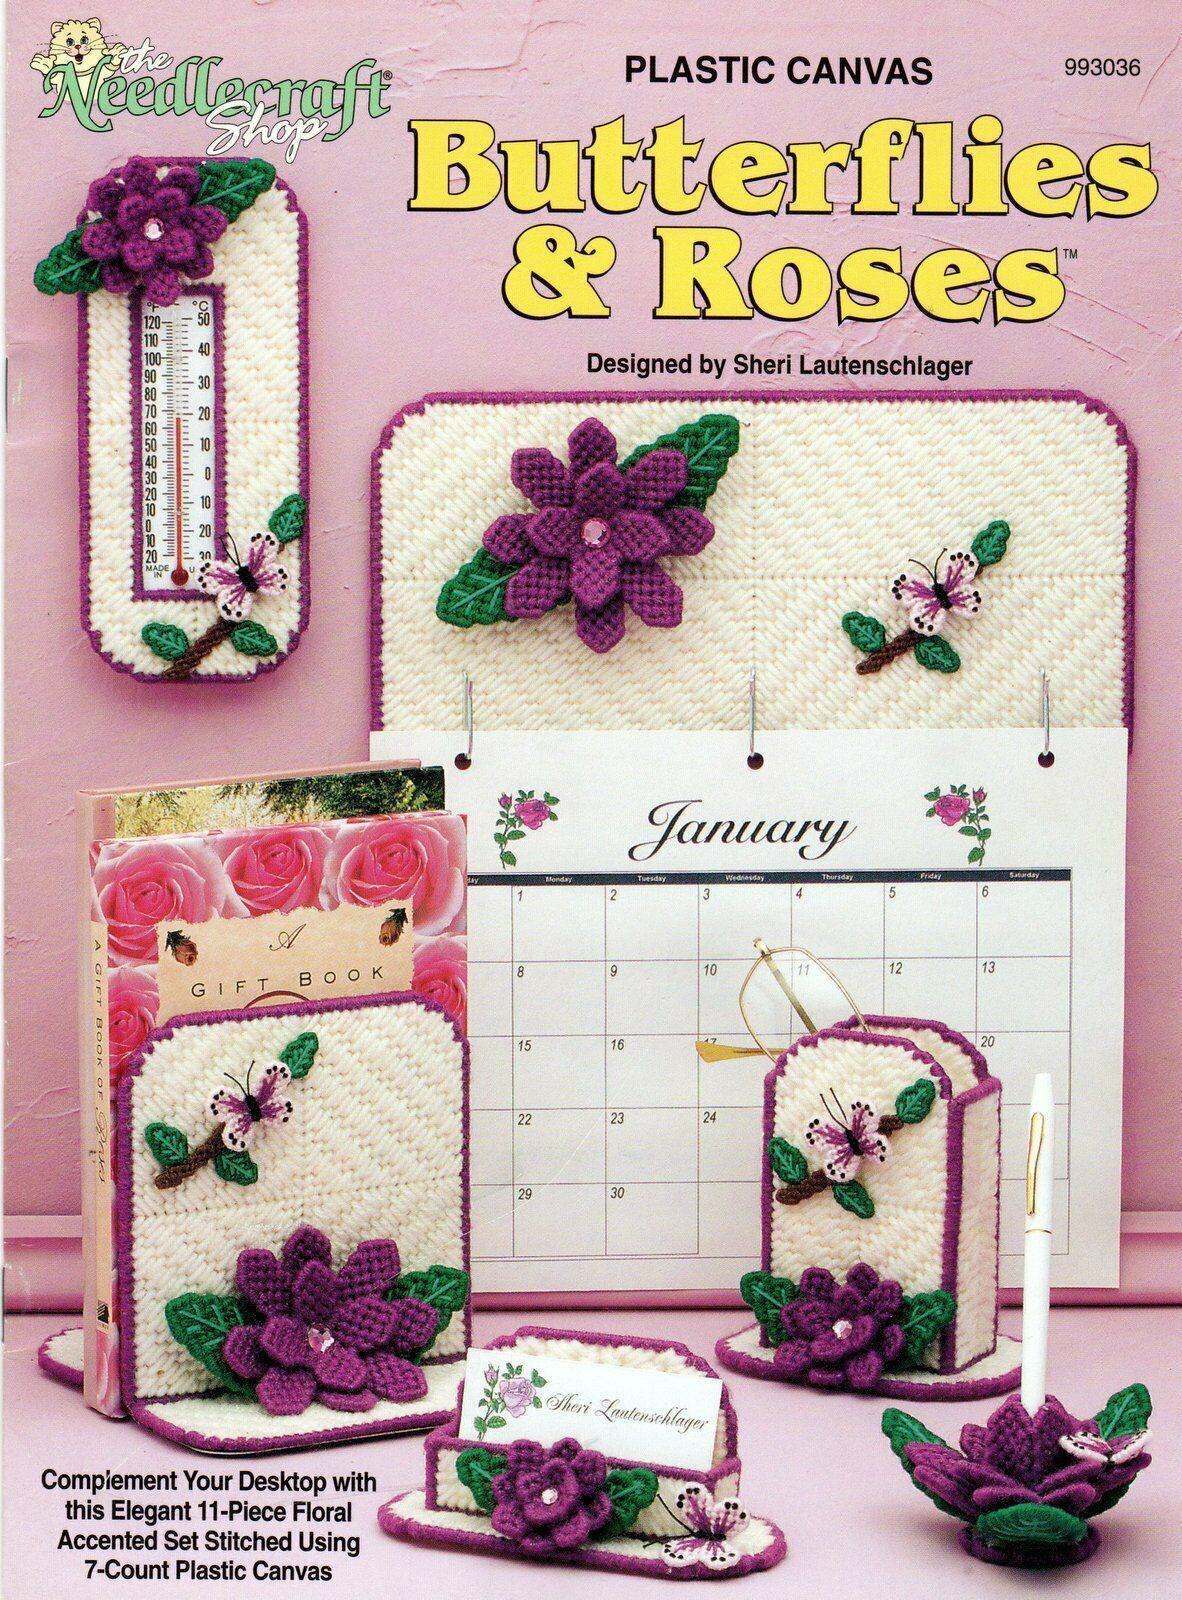 Plastic Canvas Butterflies & Roses Desktop Accessories Needlecraft Shop 993036 - $24.95